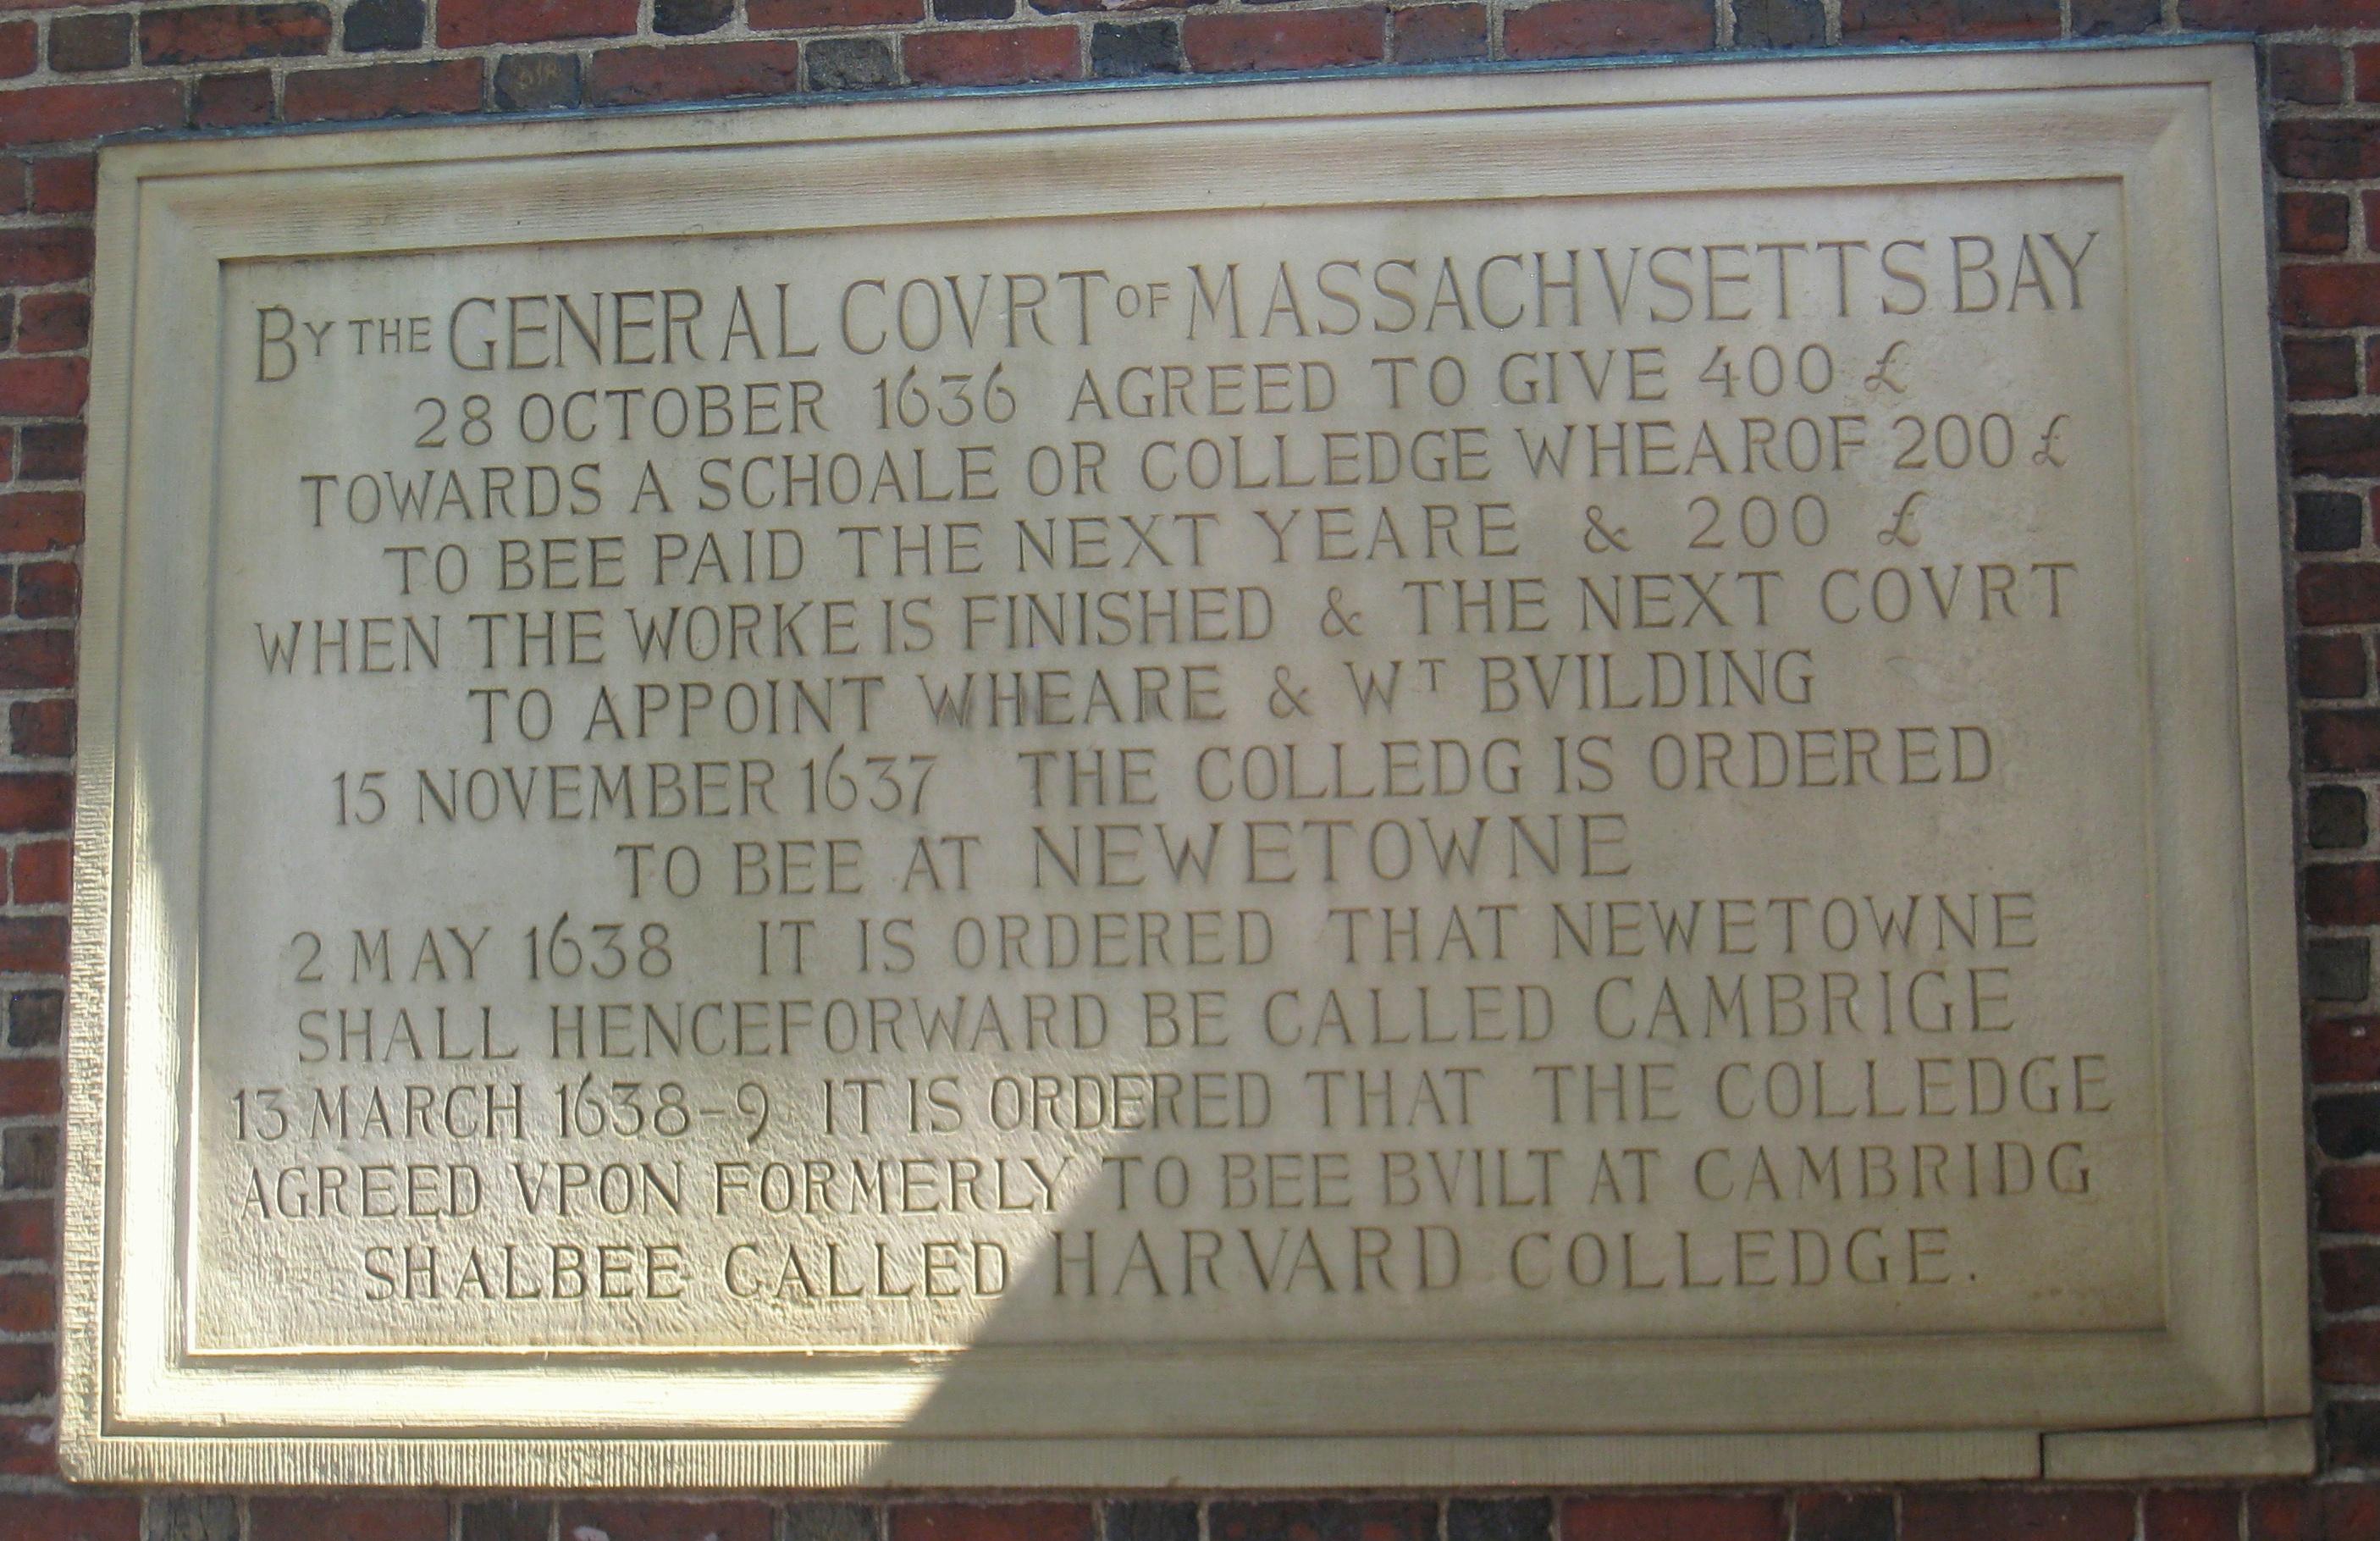 FileHarvard Colledge Plaque Harvard University